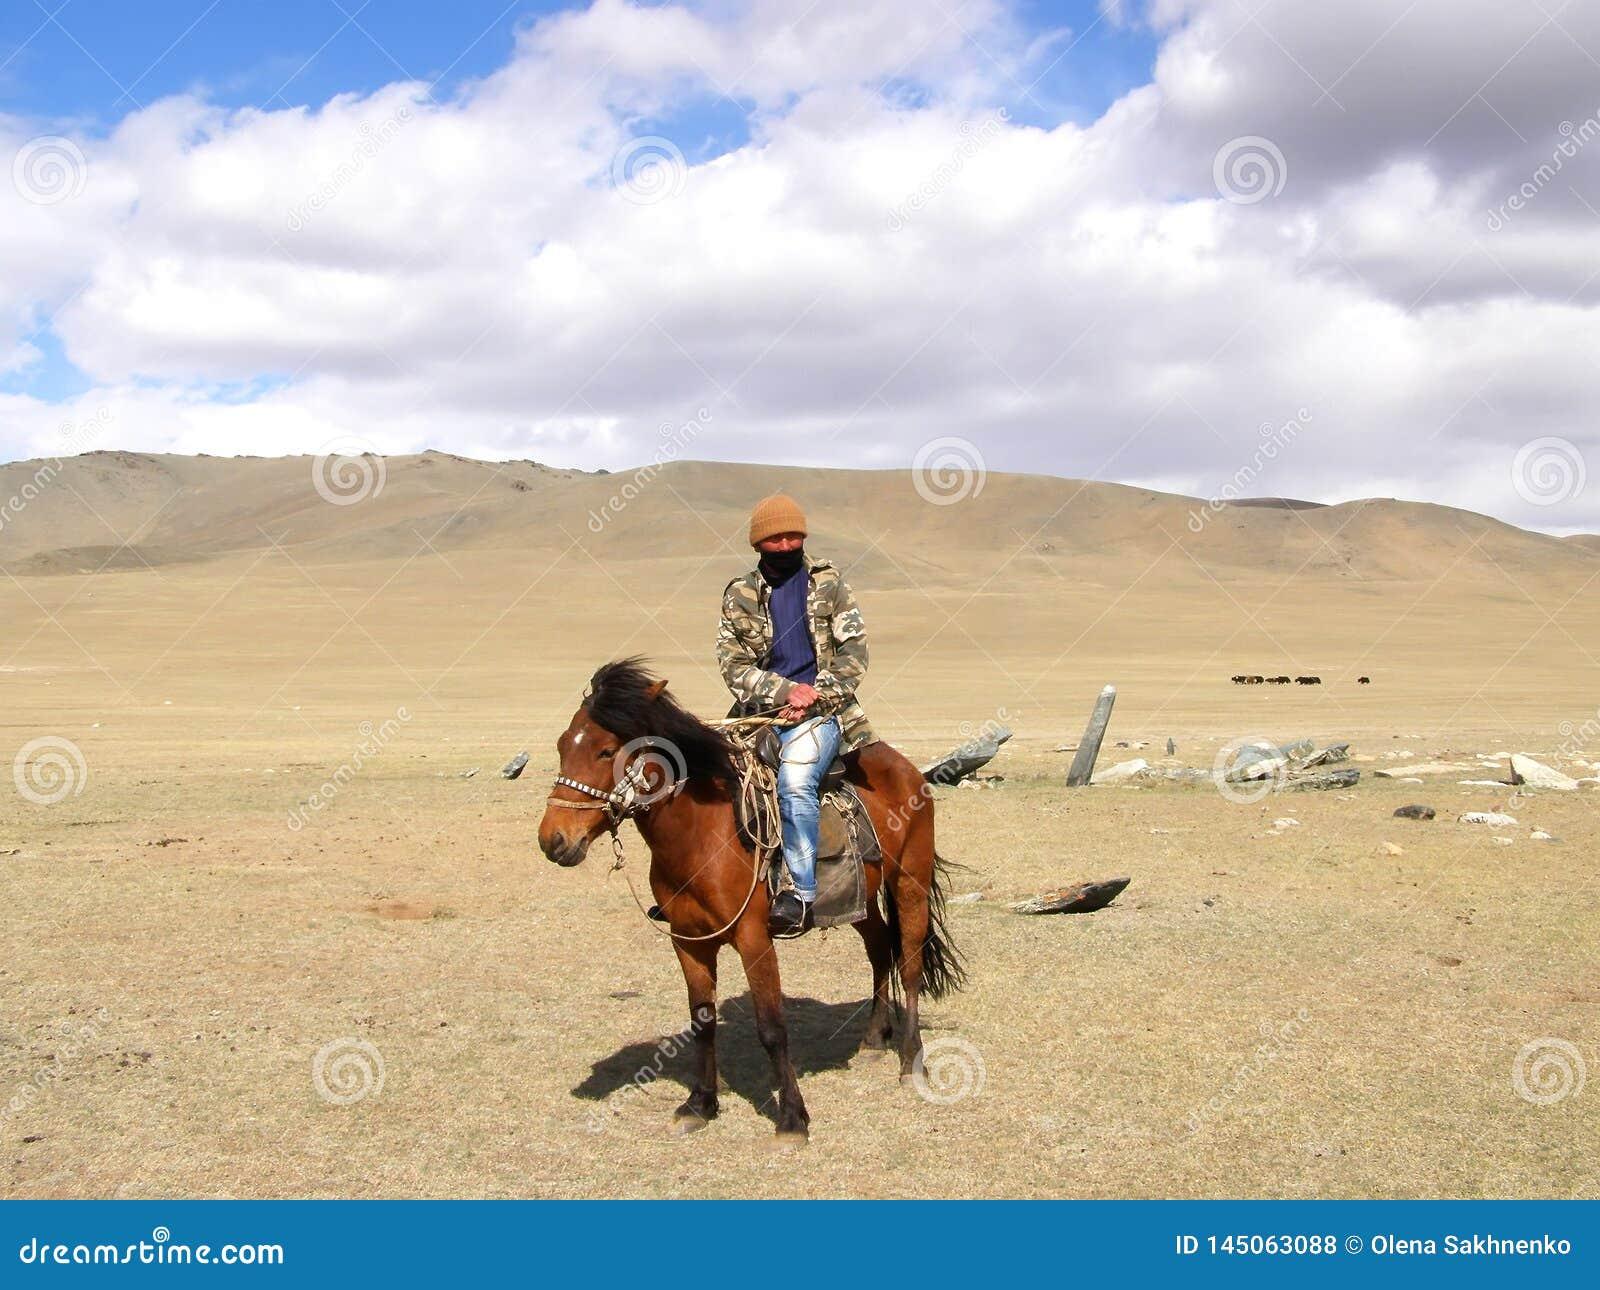 SAGSAY, MONGOLIA - MAY 22, 2012: Mongolian horseman shepherd his of sheep in the desert